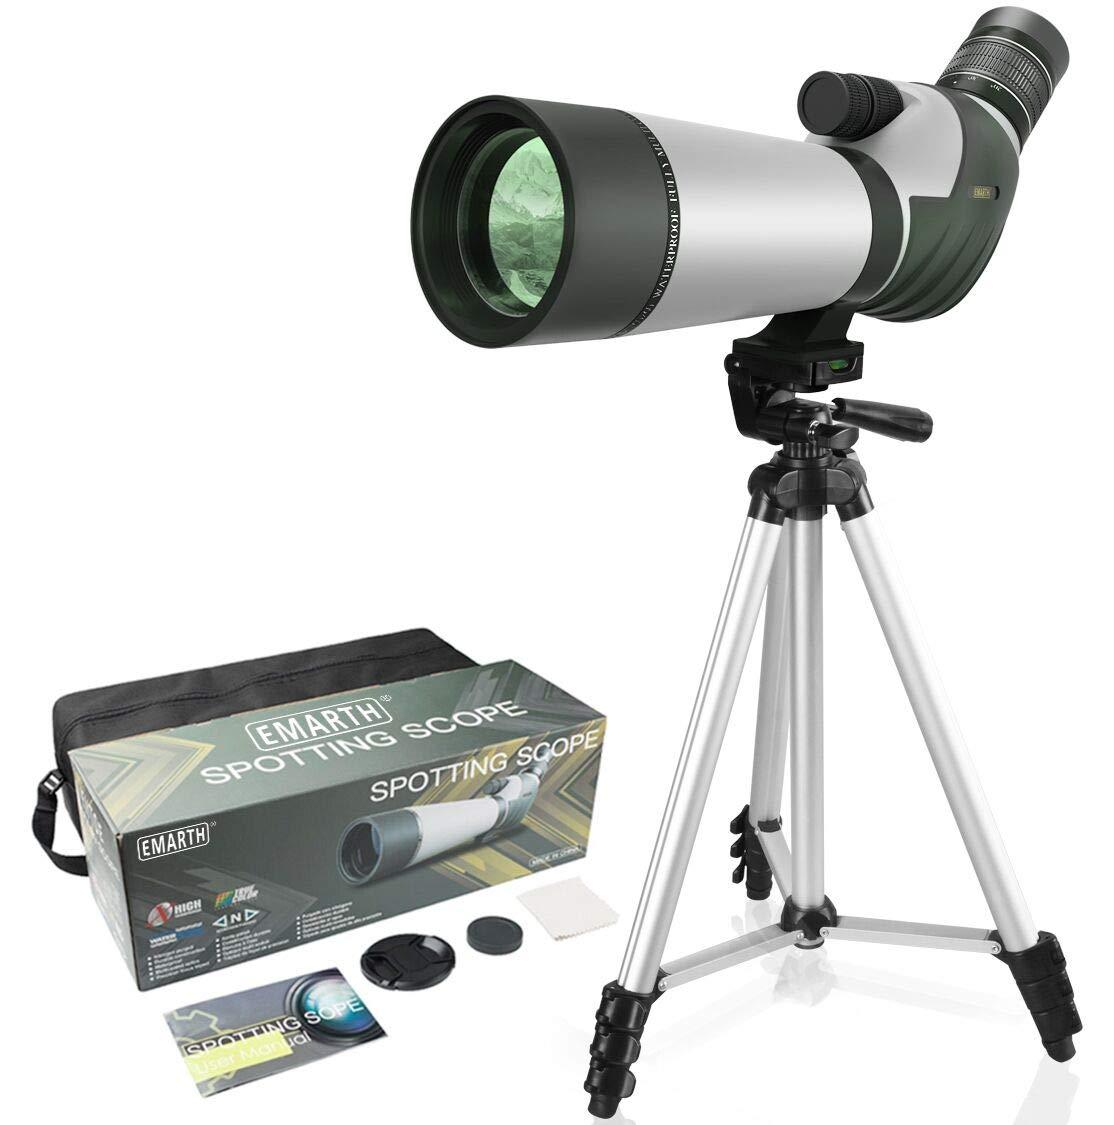 FEEMIC Upgrade 20-60×60 Waterproof Spotting Scope with Tripod, BAK4-45 Degree Angled Big Eyepiece 24mm , Optics Zoom 47-23.5M 1000M Spotting Scope for Target Shooting Bird Watching Hunting Wildlife